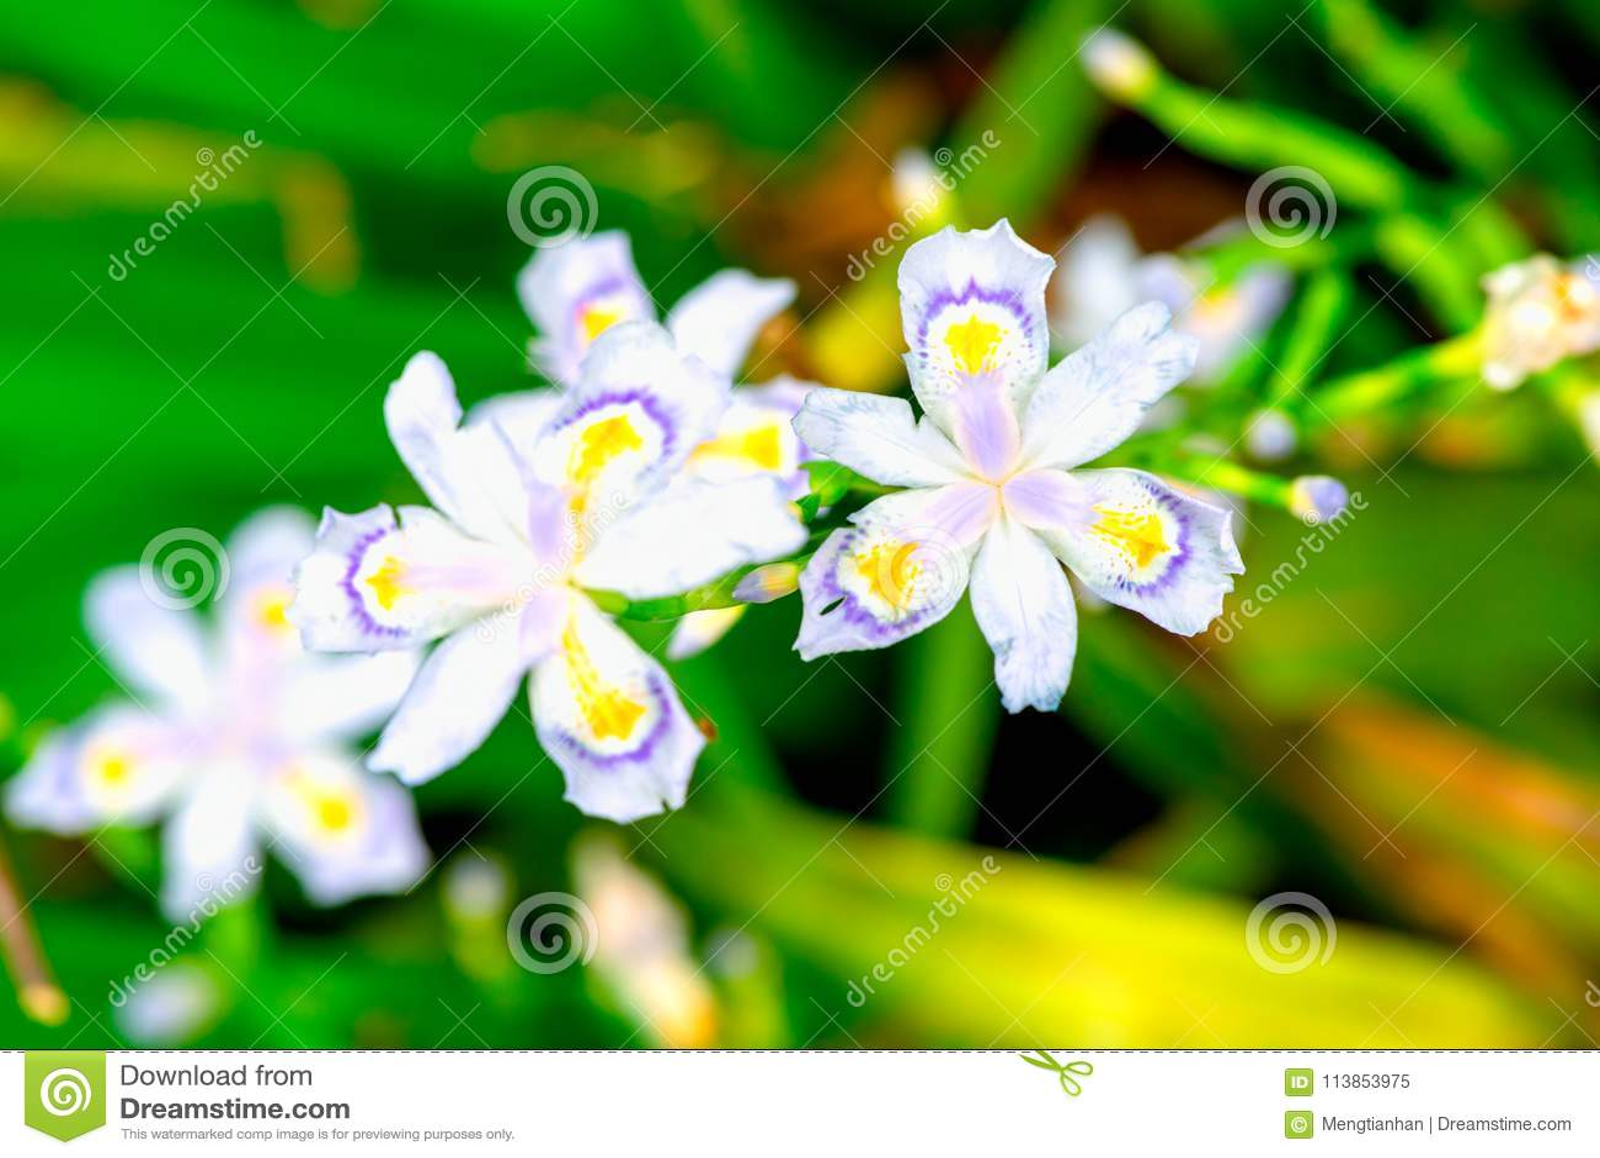 Download Iris Germanica L Iris Tectorum Maxim Stock Image   Image Of Garden,  Bright